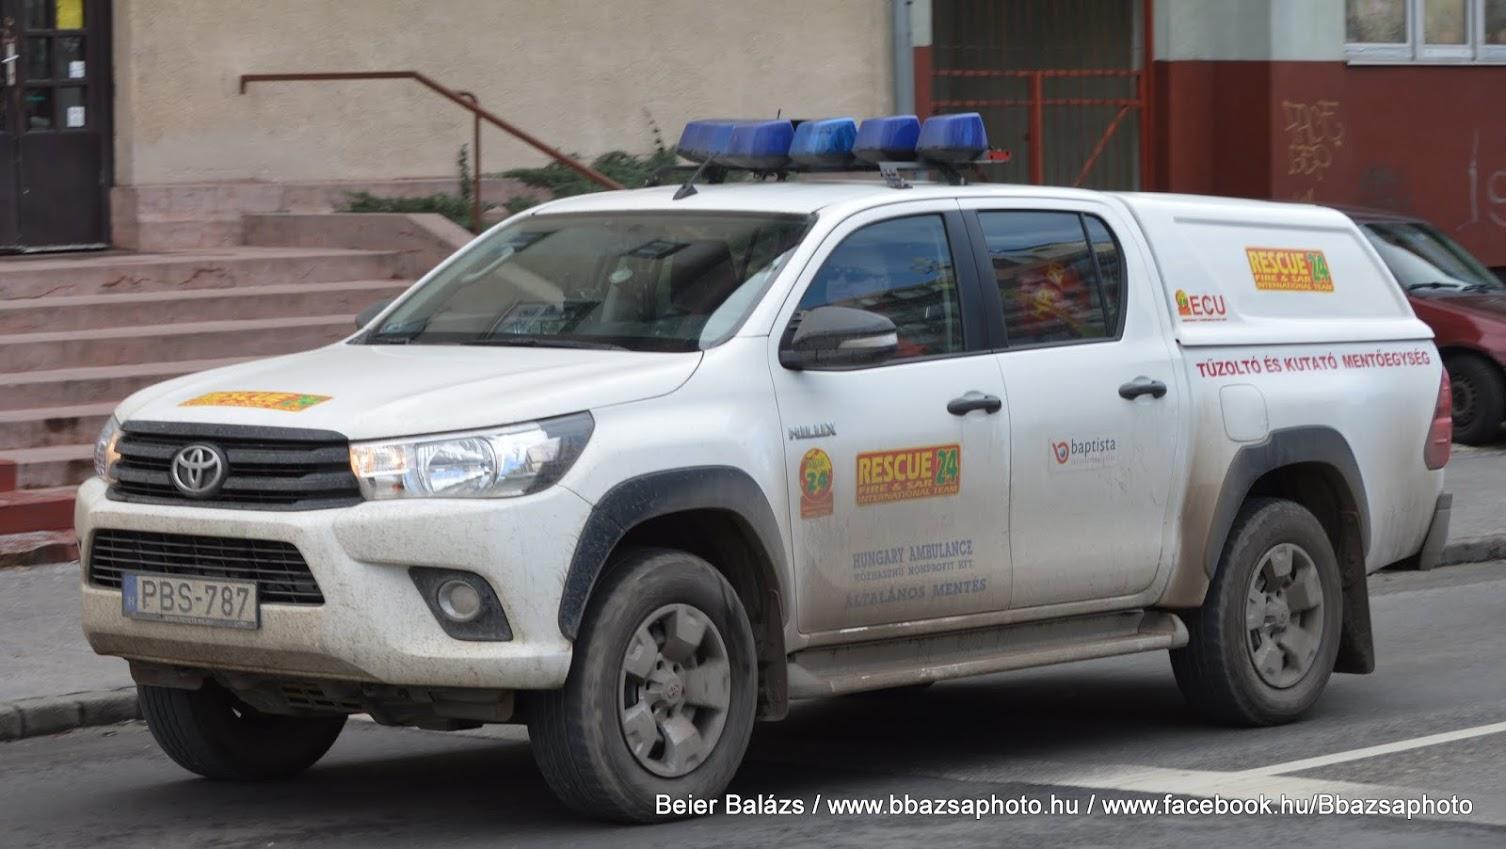 Toyota Hilux – Rescue24